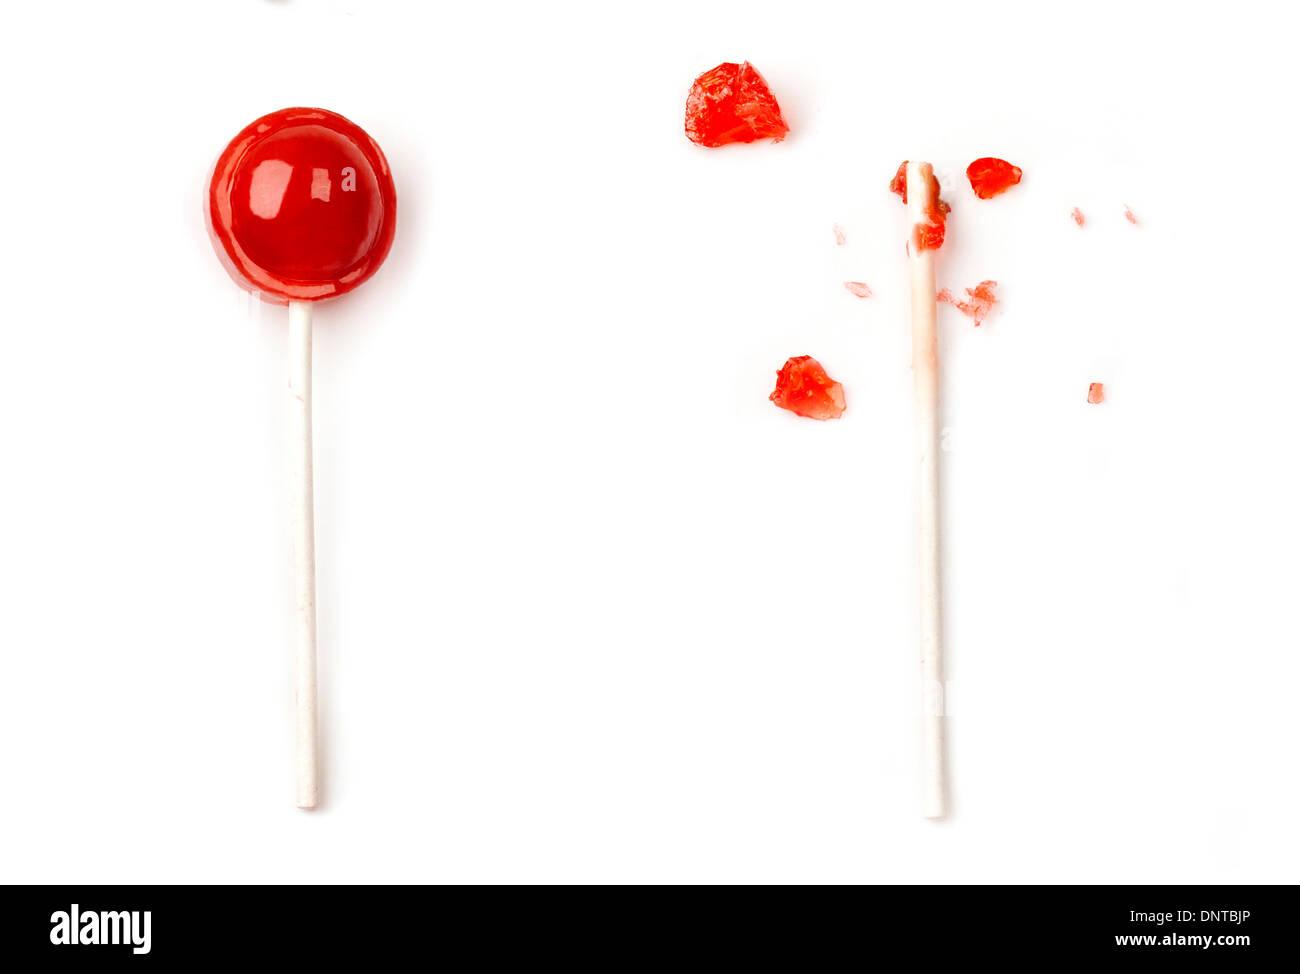 gegessen Tootsie roll pop Stockbild